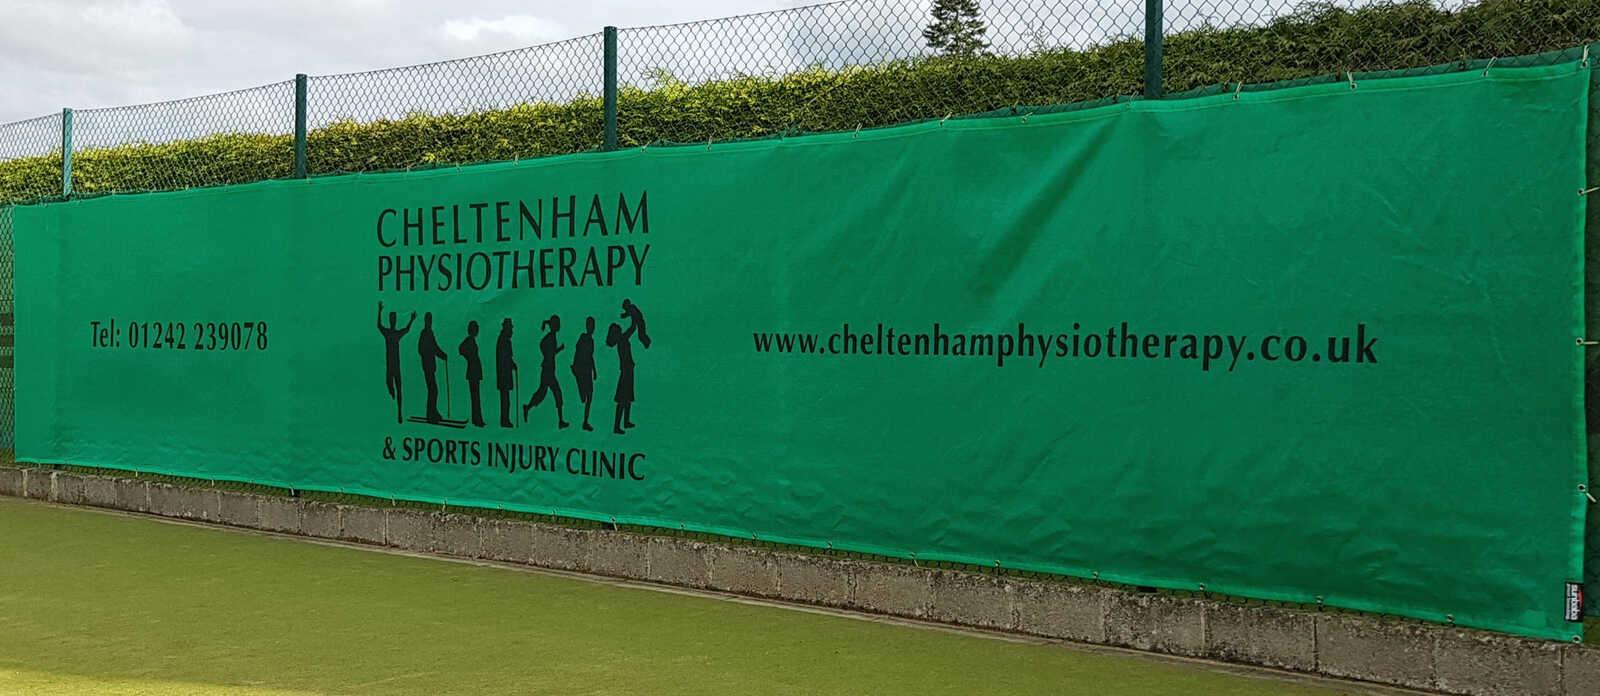 Cheltenham Physiotherapy Austronet Branding